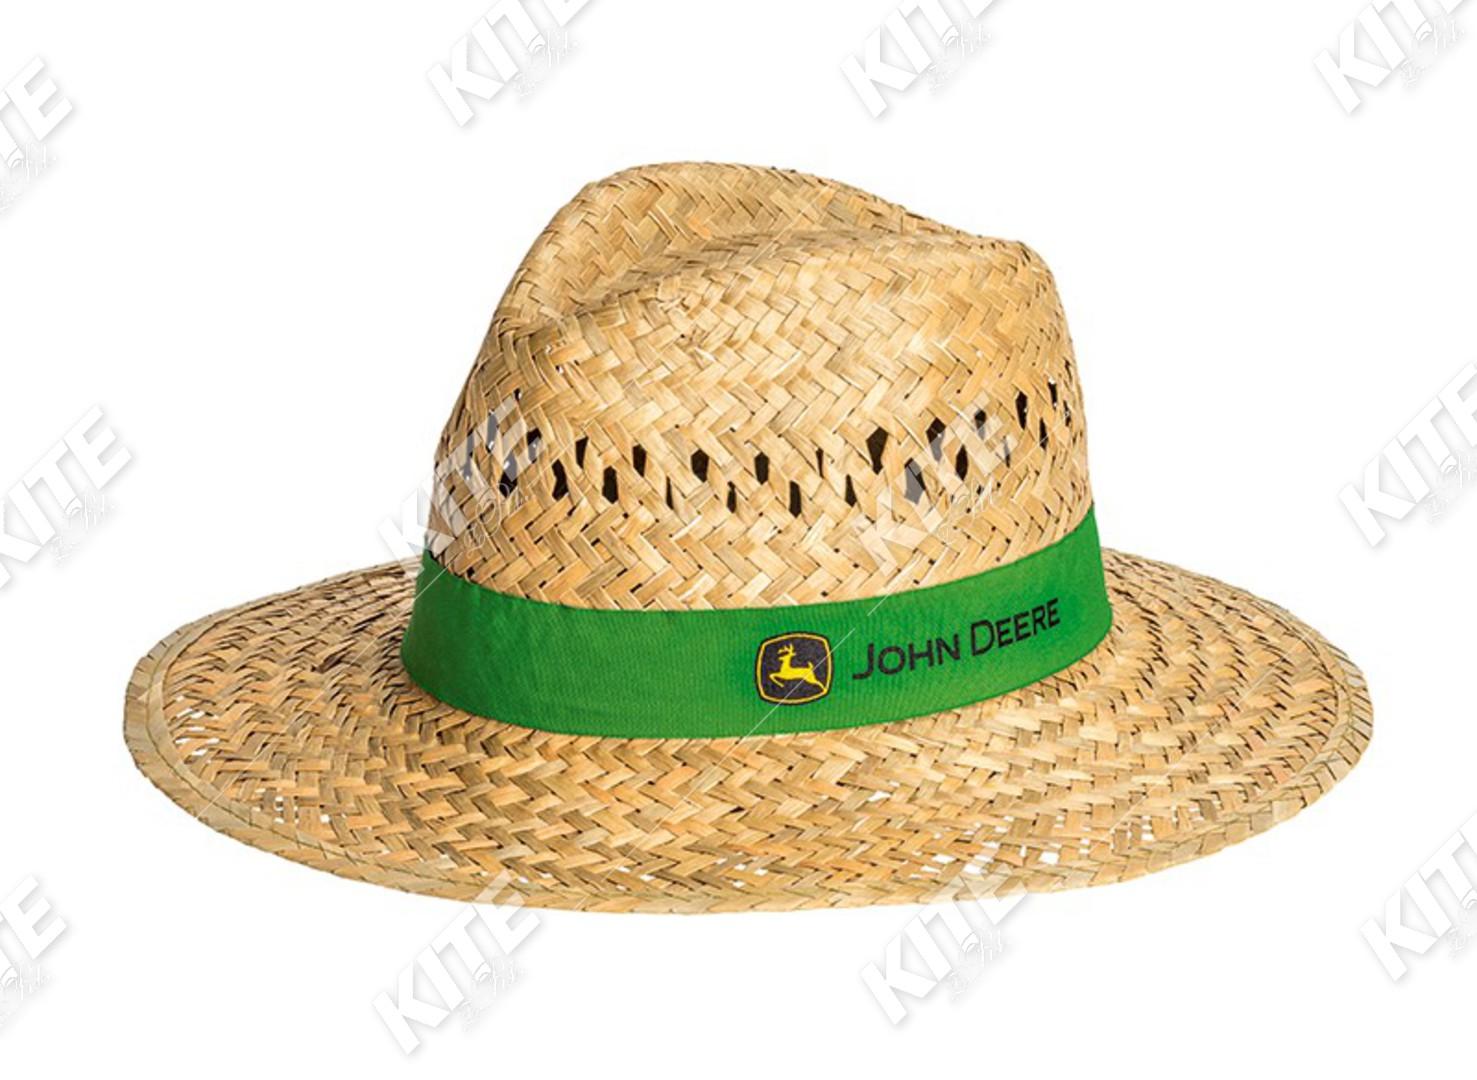 John Deere szalmakalap